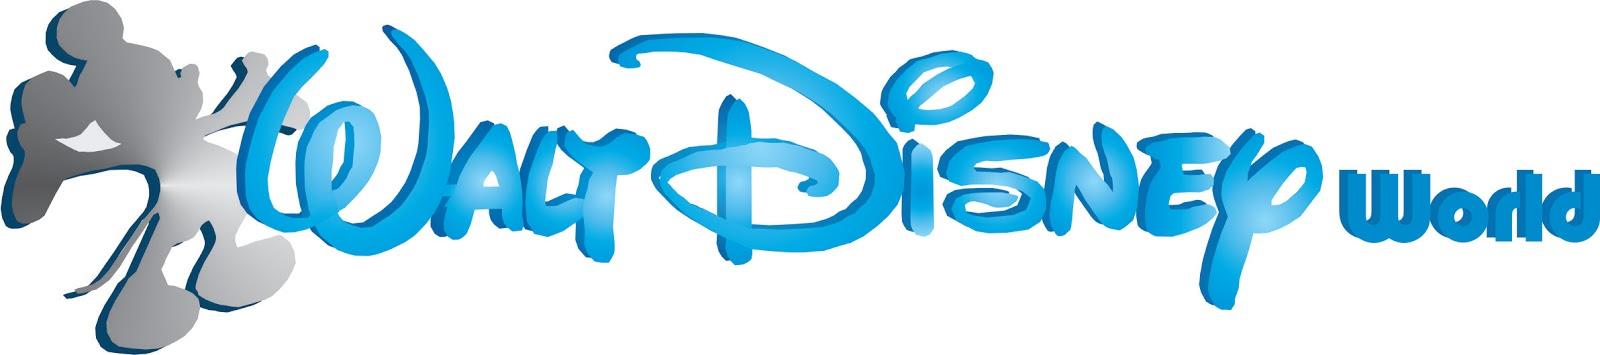 pz c disney logo